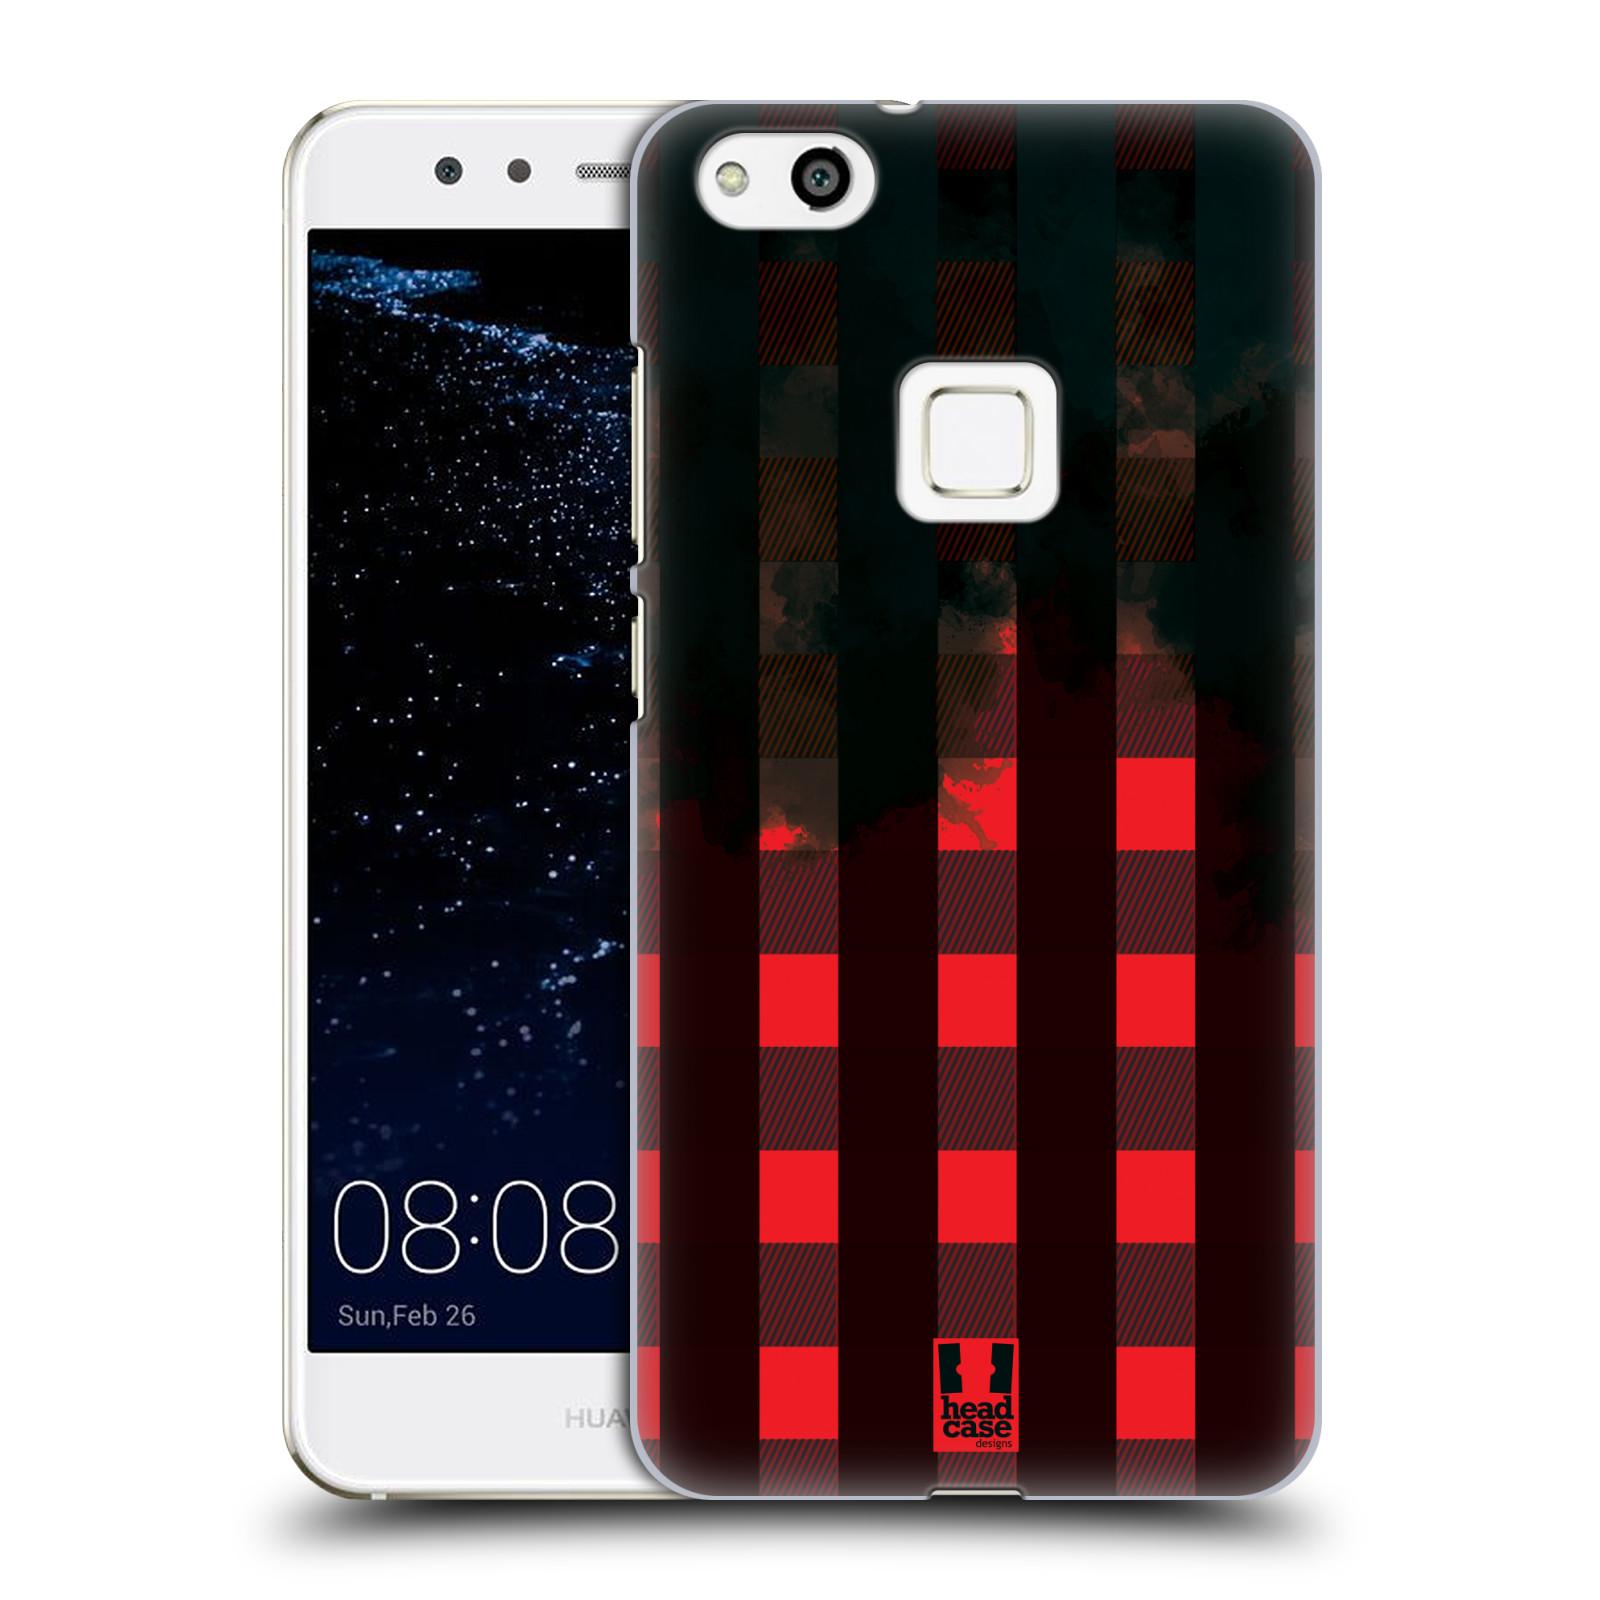 Plastové pouzdro na mobil Huawei P10 Lite Head Case - FLANEL RED BLACK (Plastový kryt či obal na mobilní telefon Huawei P10 Lite Dual SIM (LX1/LX1A))